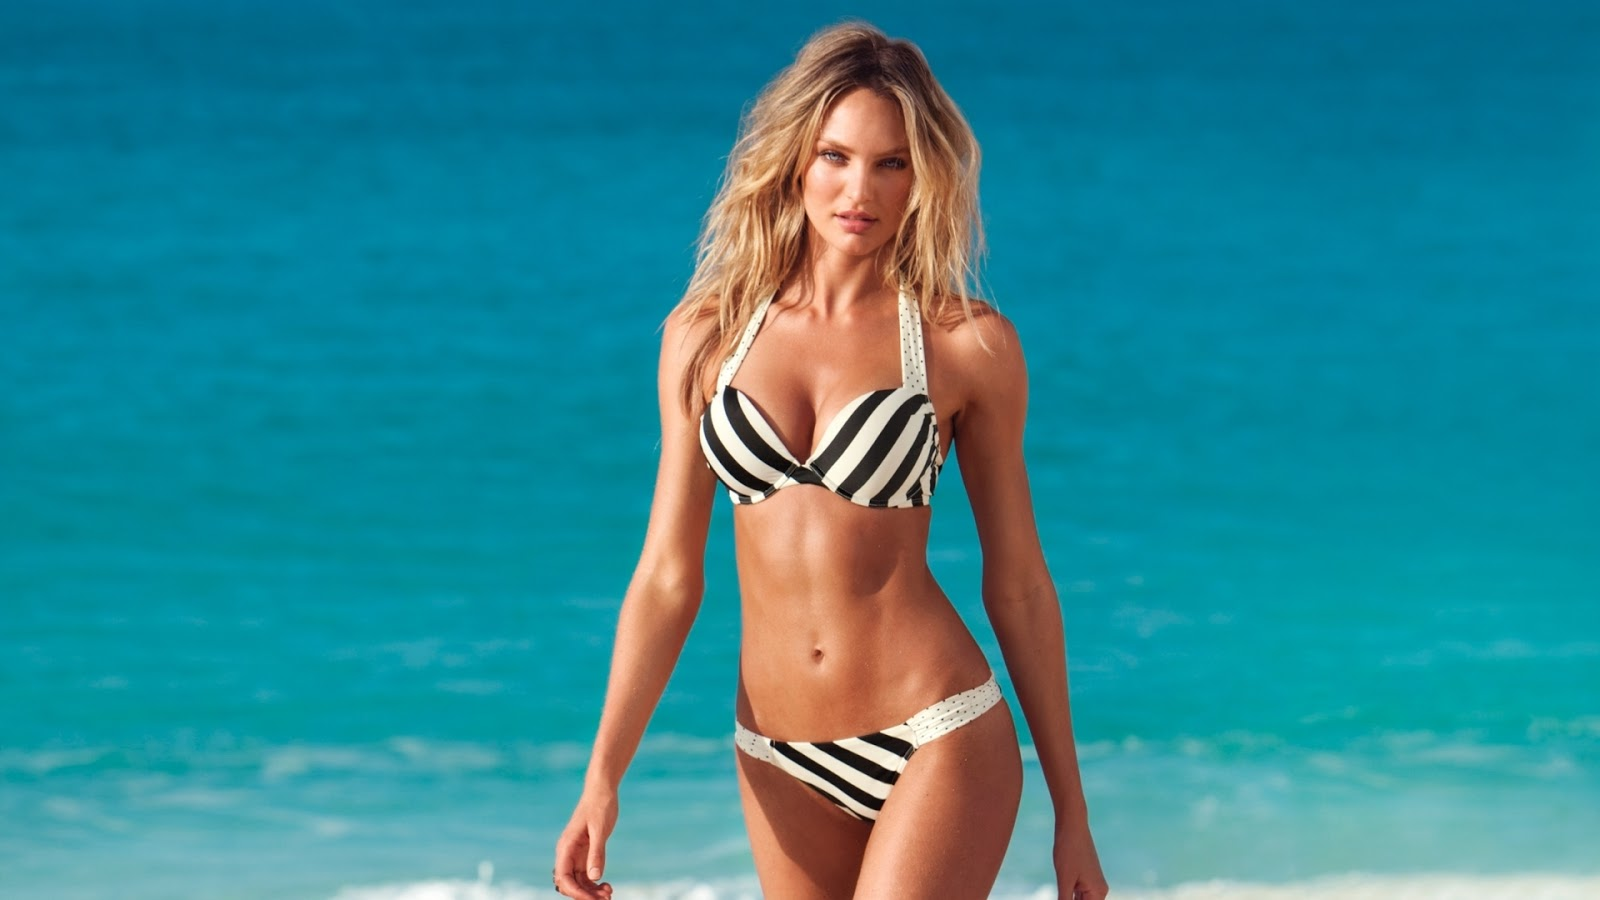 Model Candice Swanepoel HD Hot Wallpaper